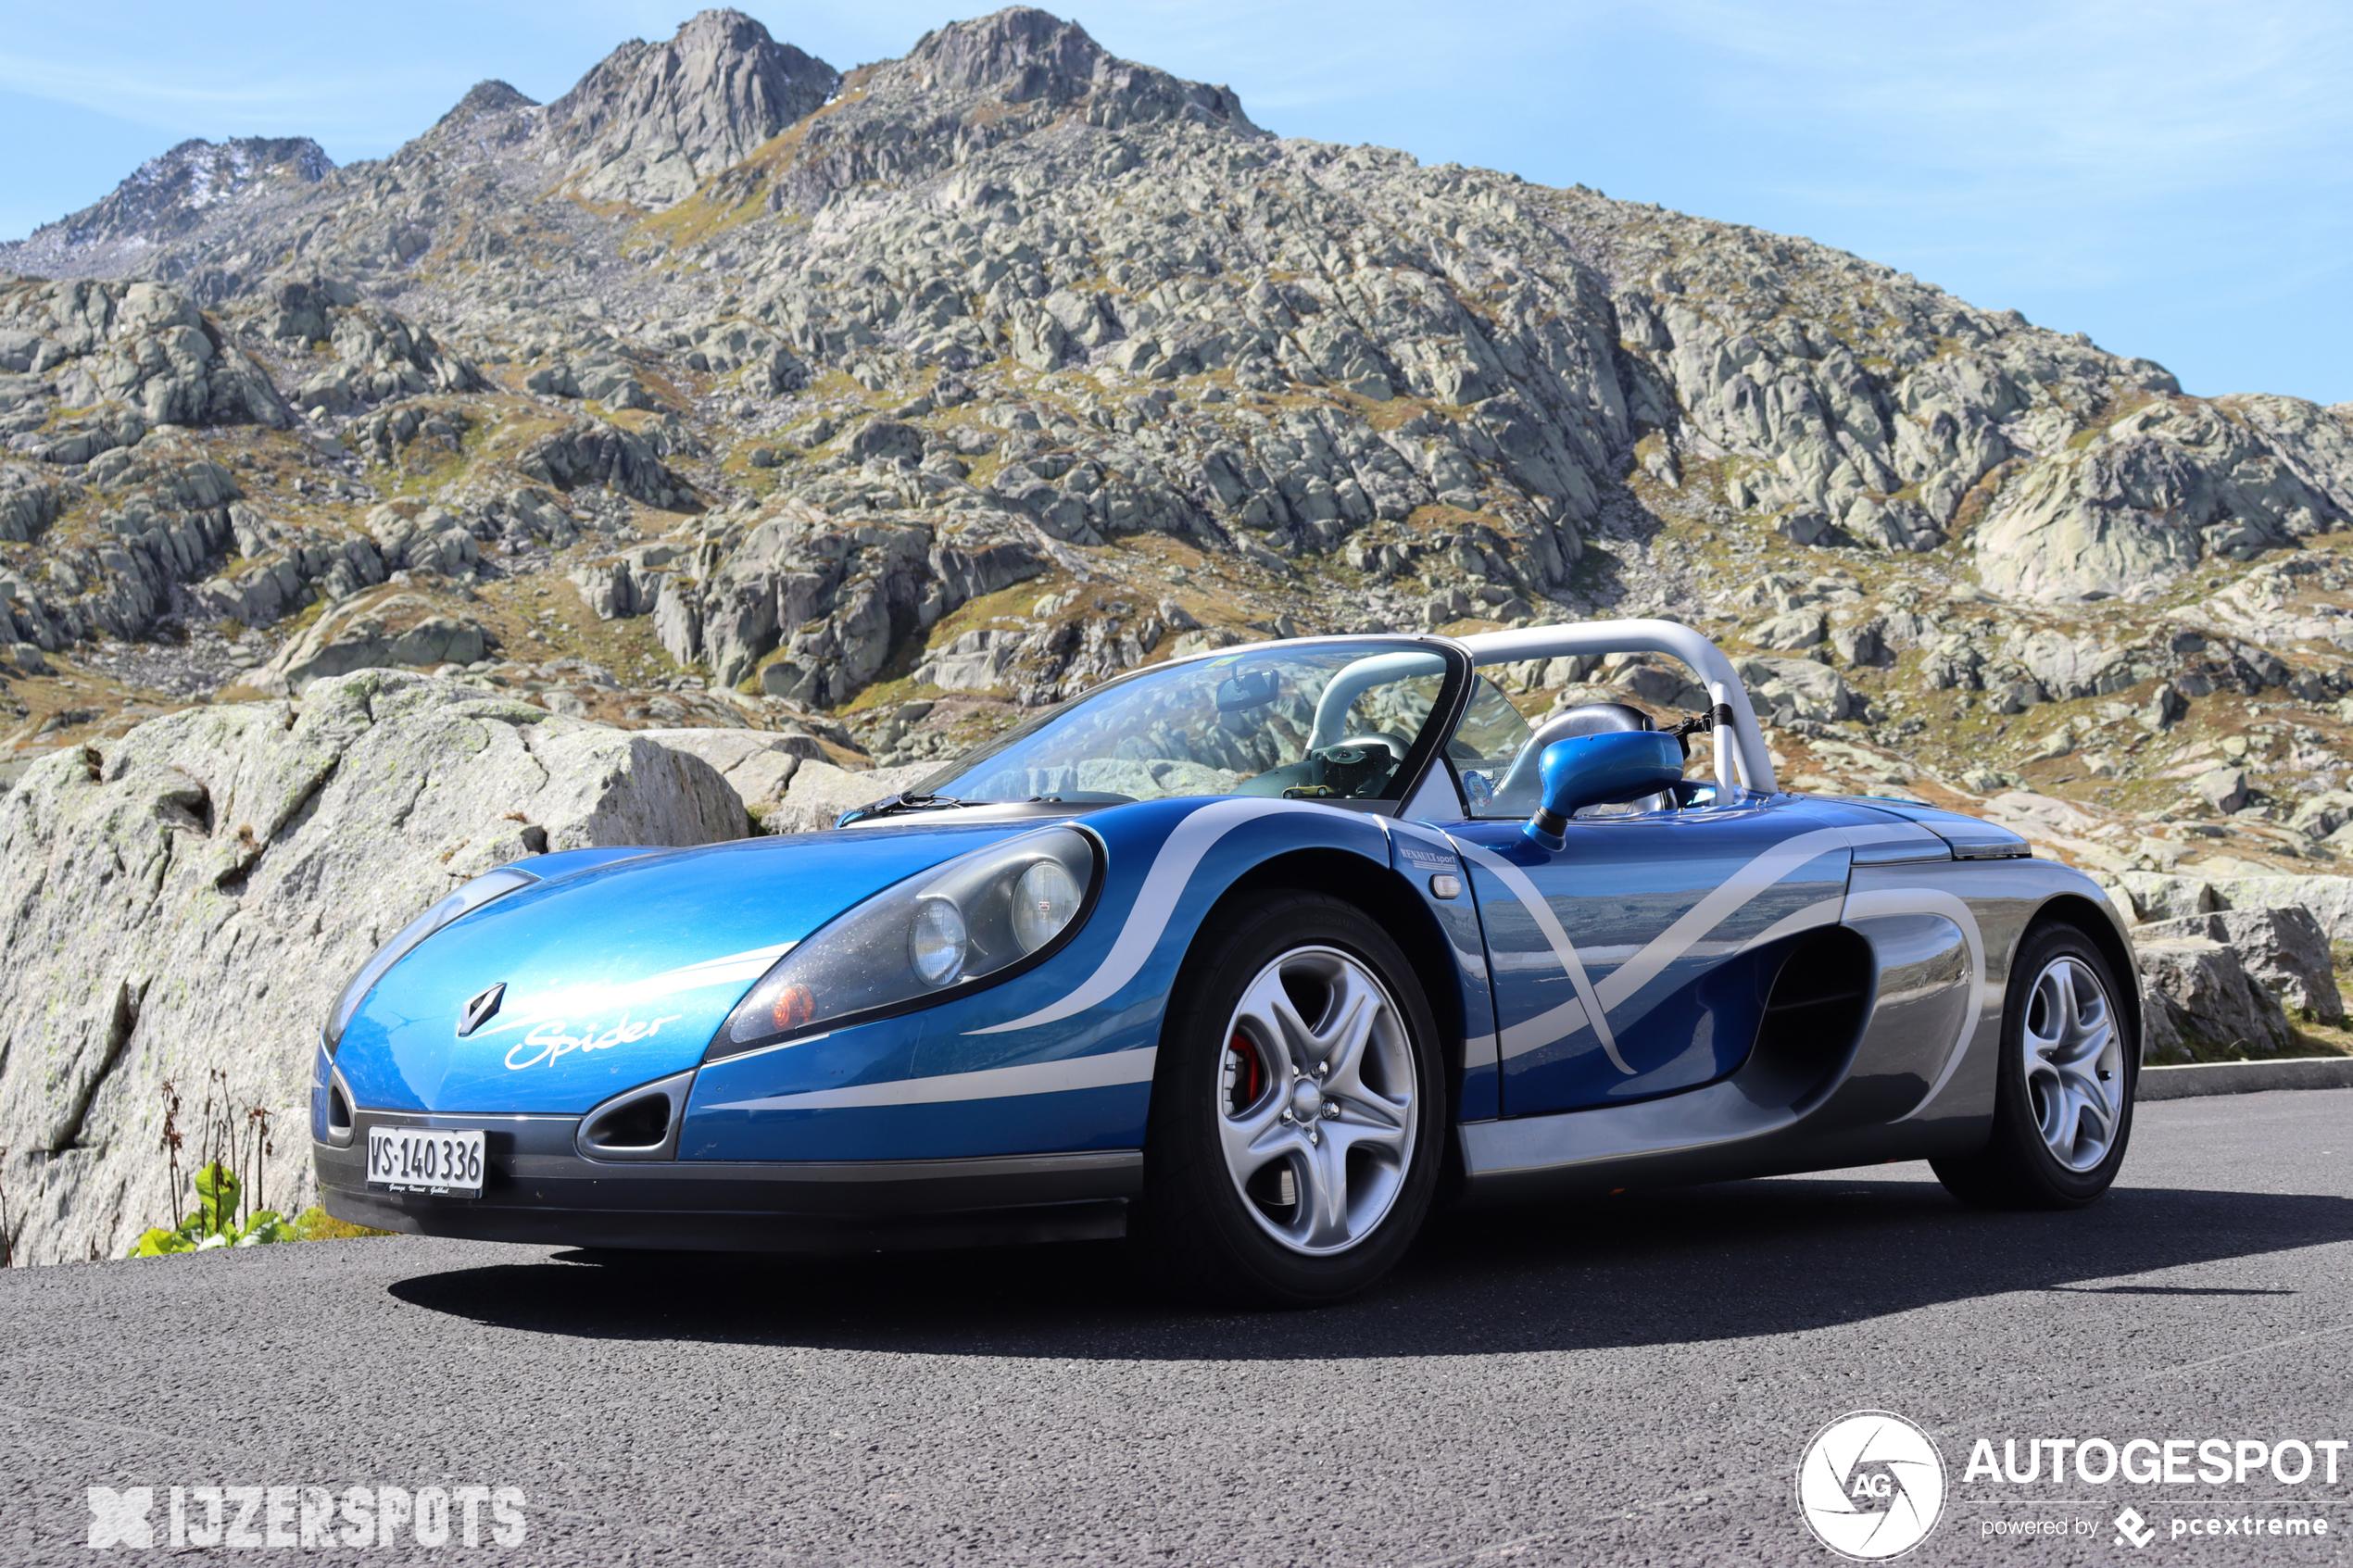 Renault Sport Spider knalt over de Gotthardpas